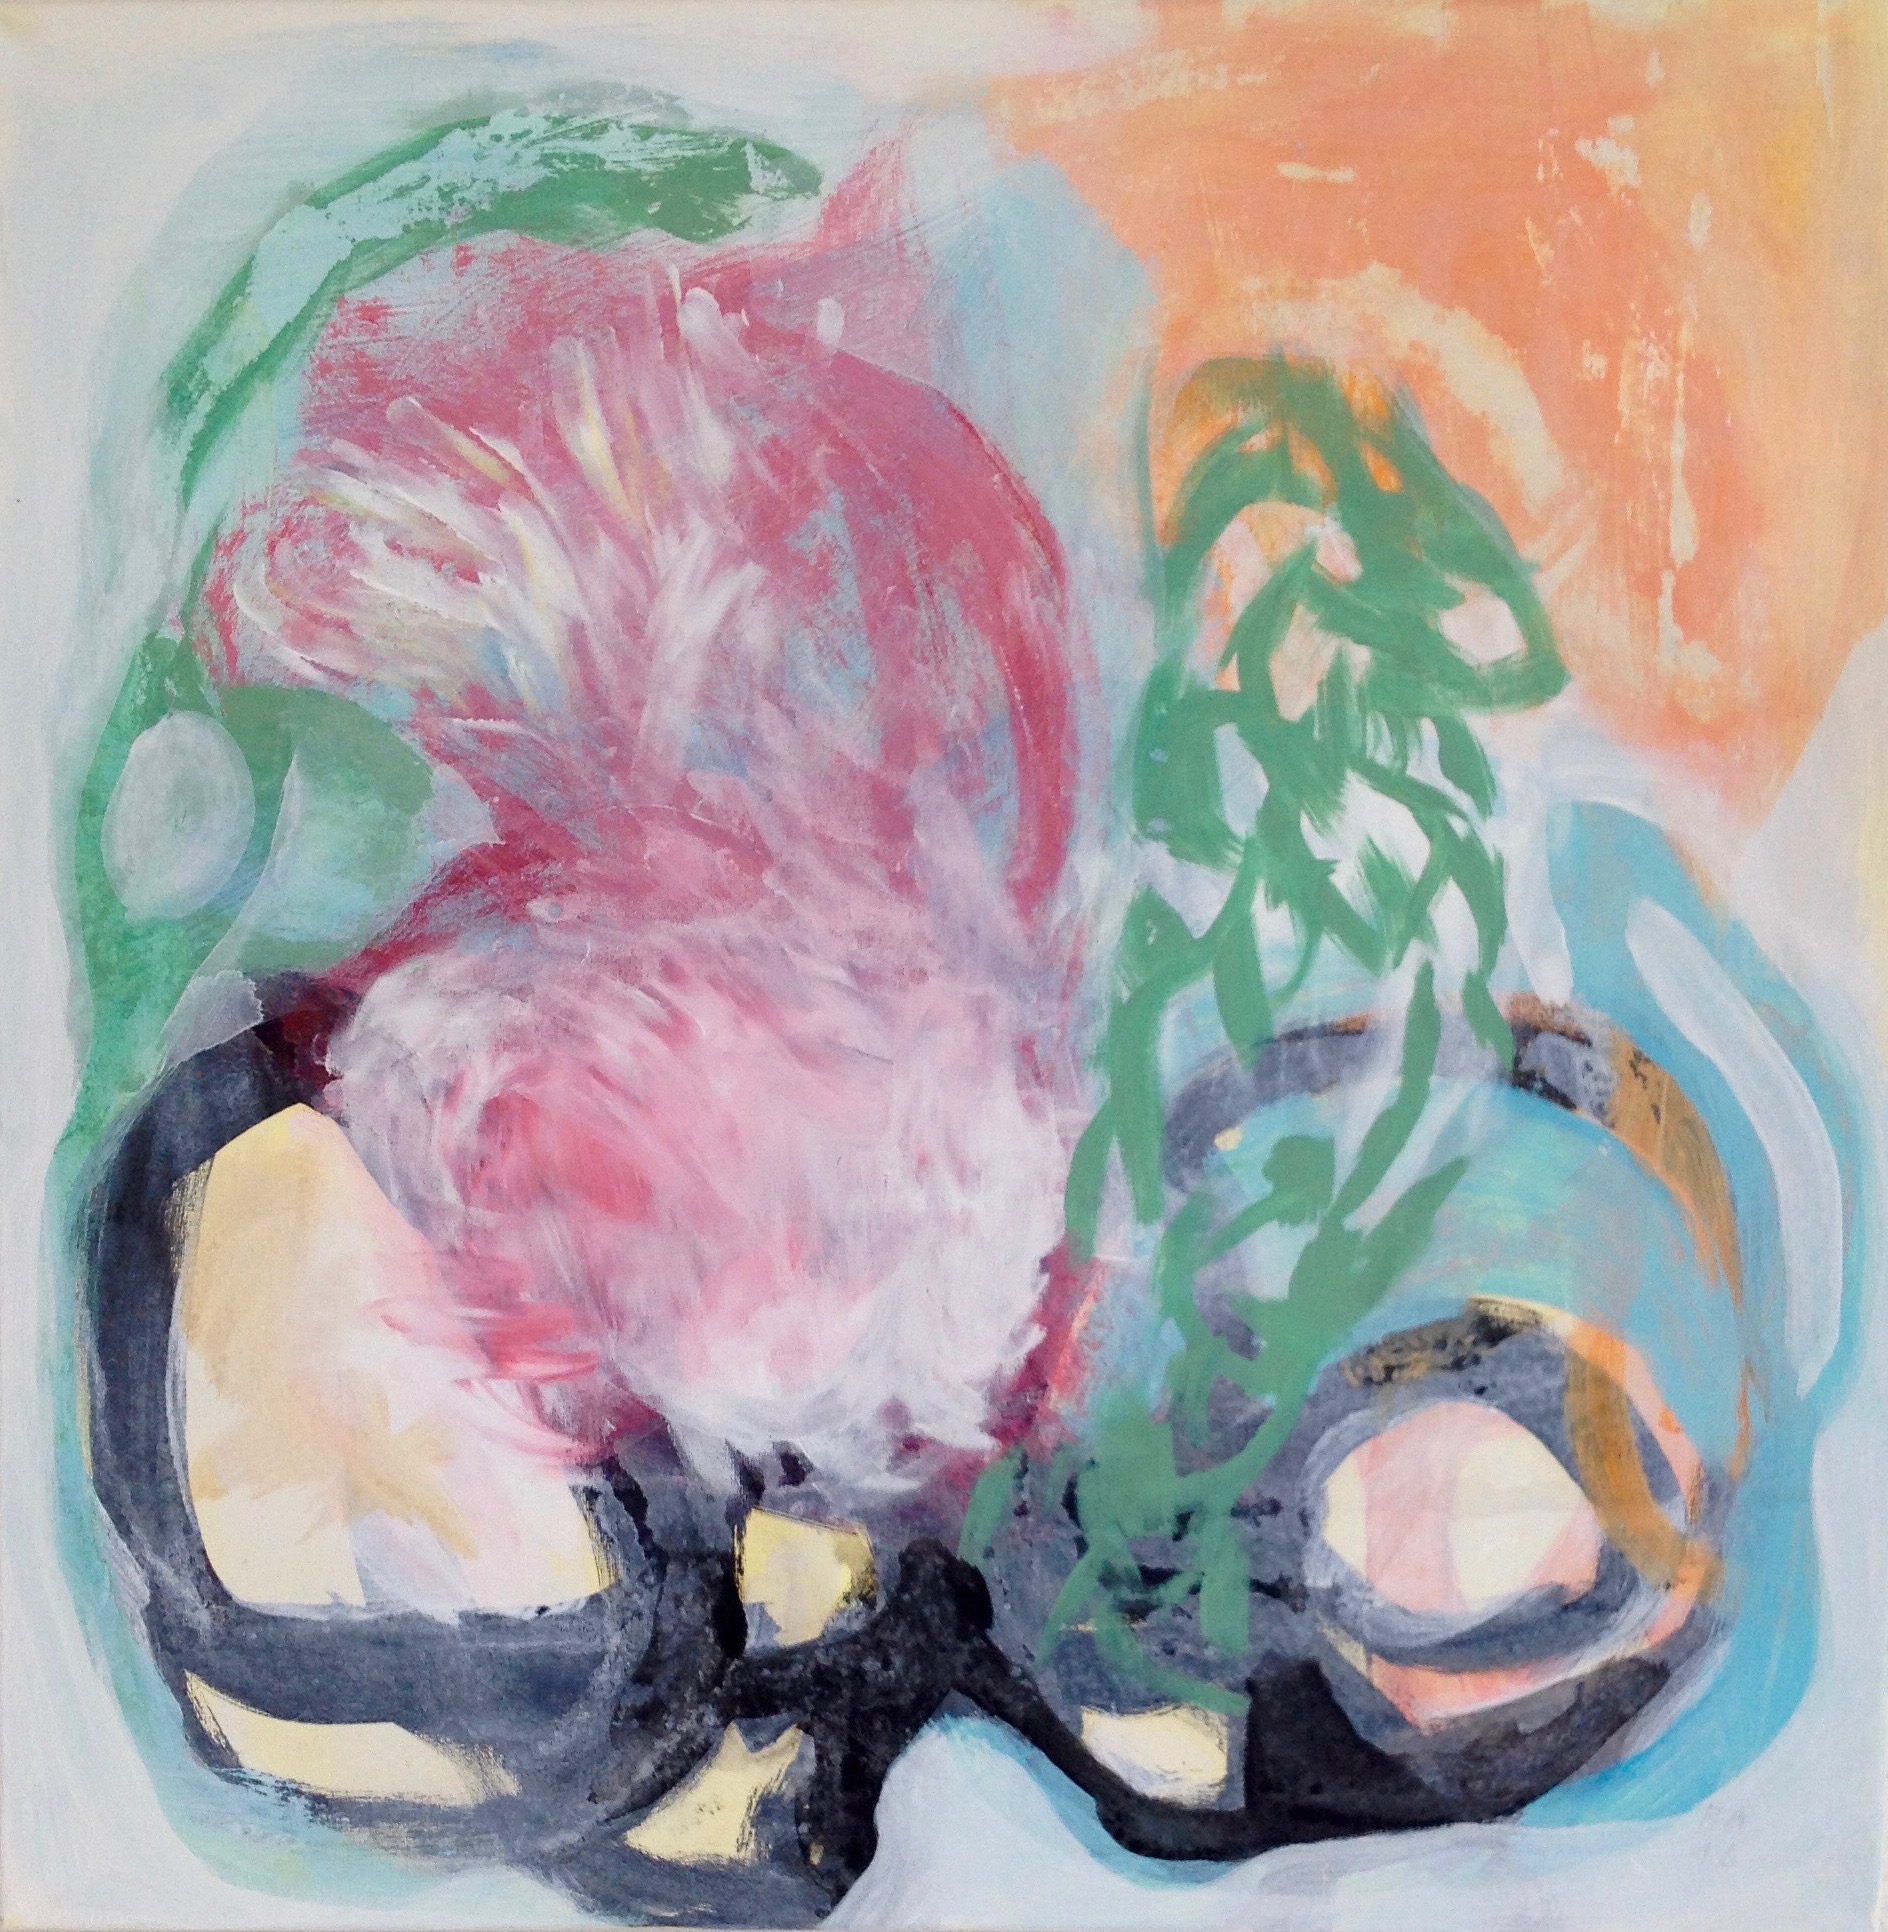 Brigitt Andermatt, Ohne Titel, Acryl auf Leinwand, 2018